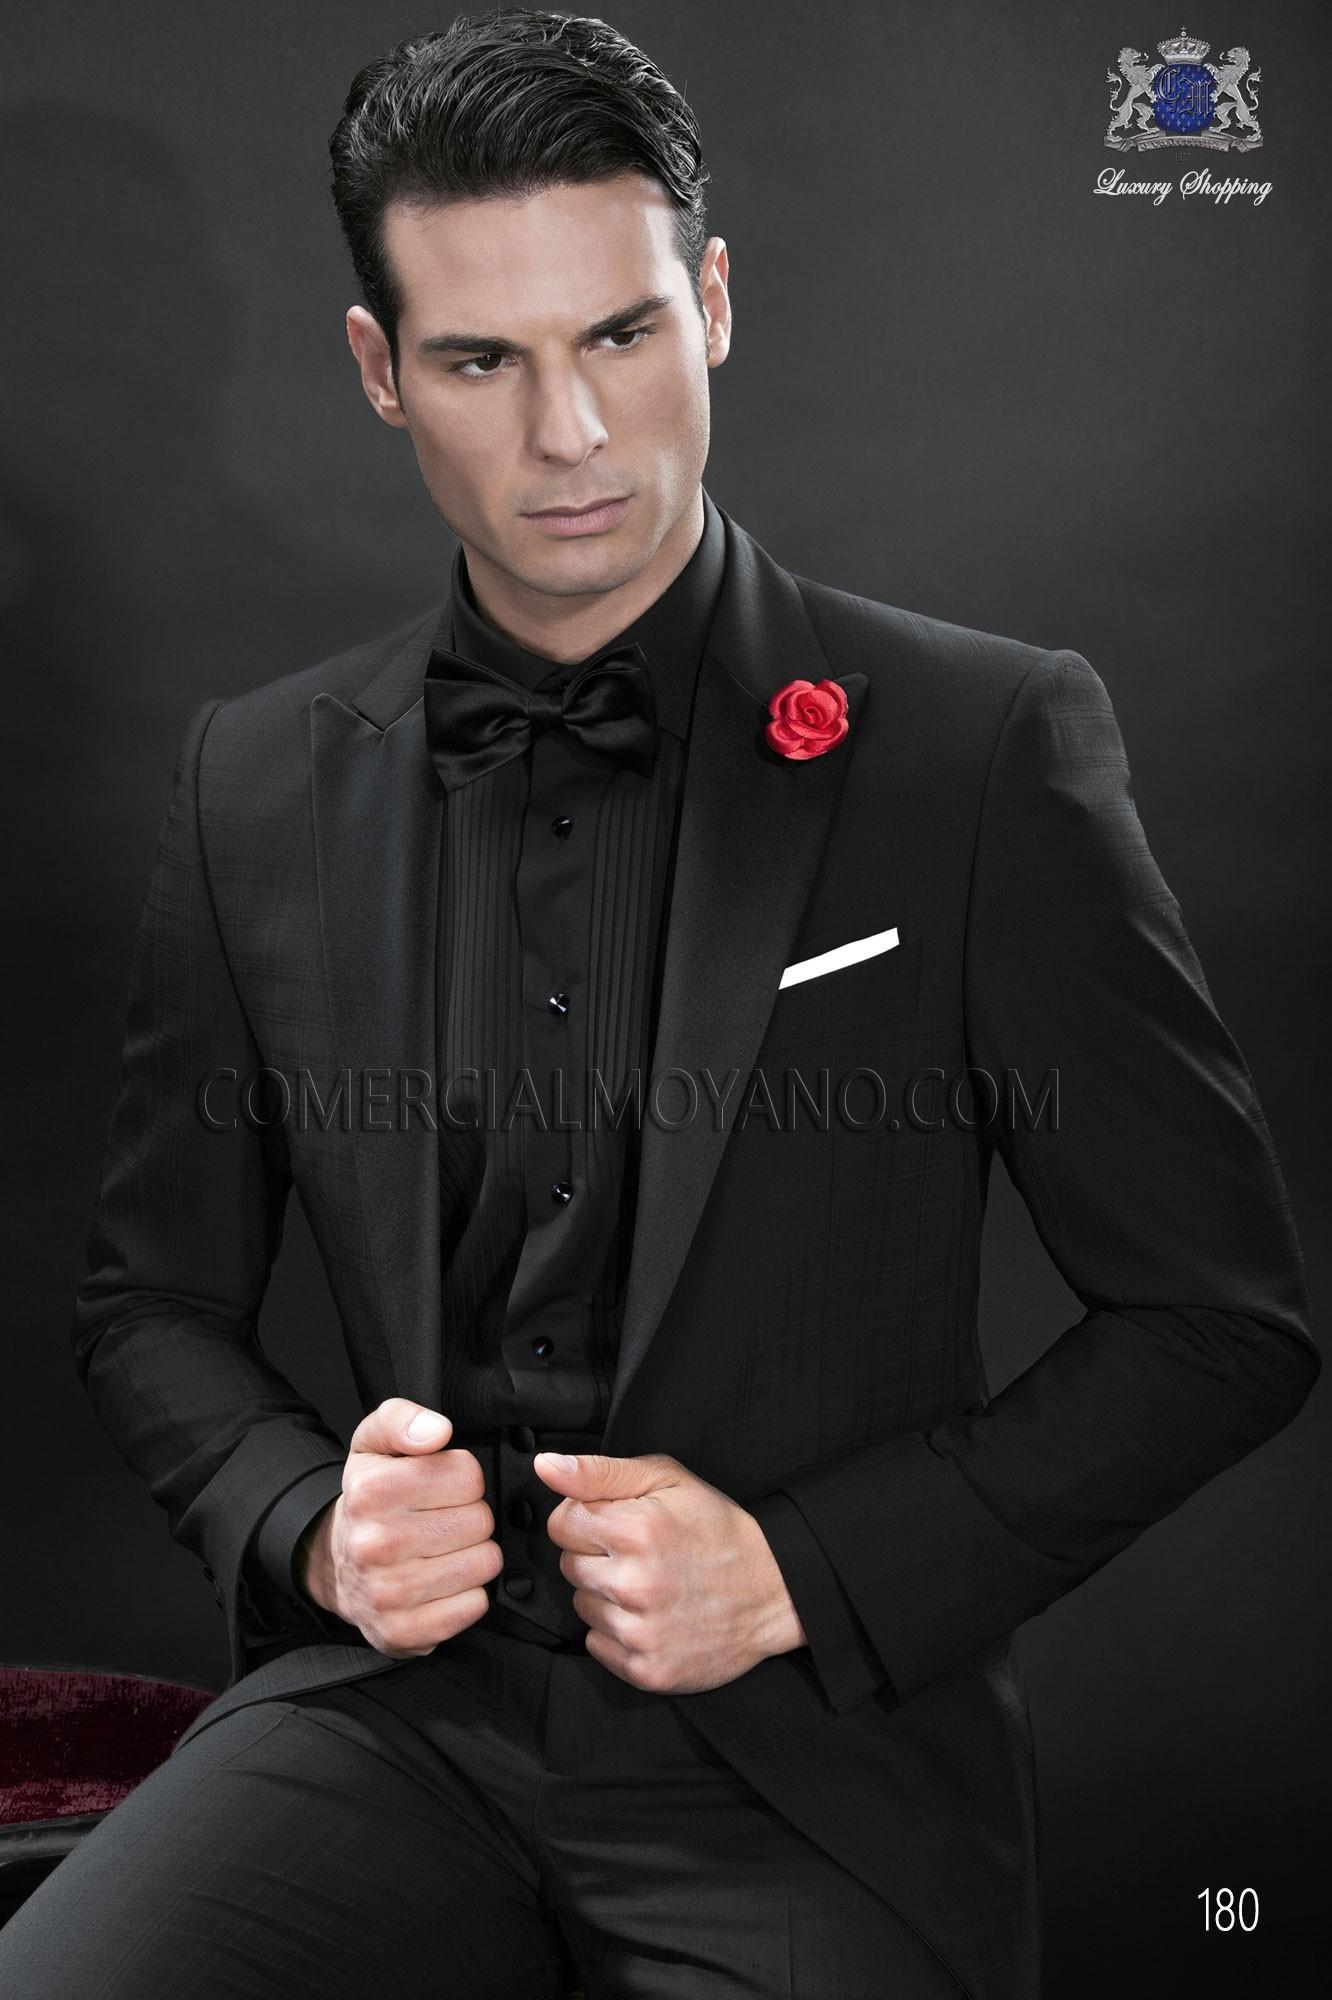 Black Tie black men wedding suit model 180 Ottavio Nuccio Gala